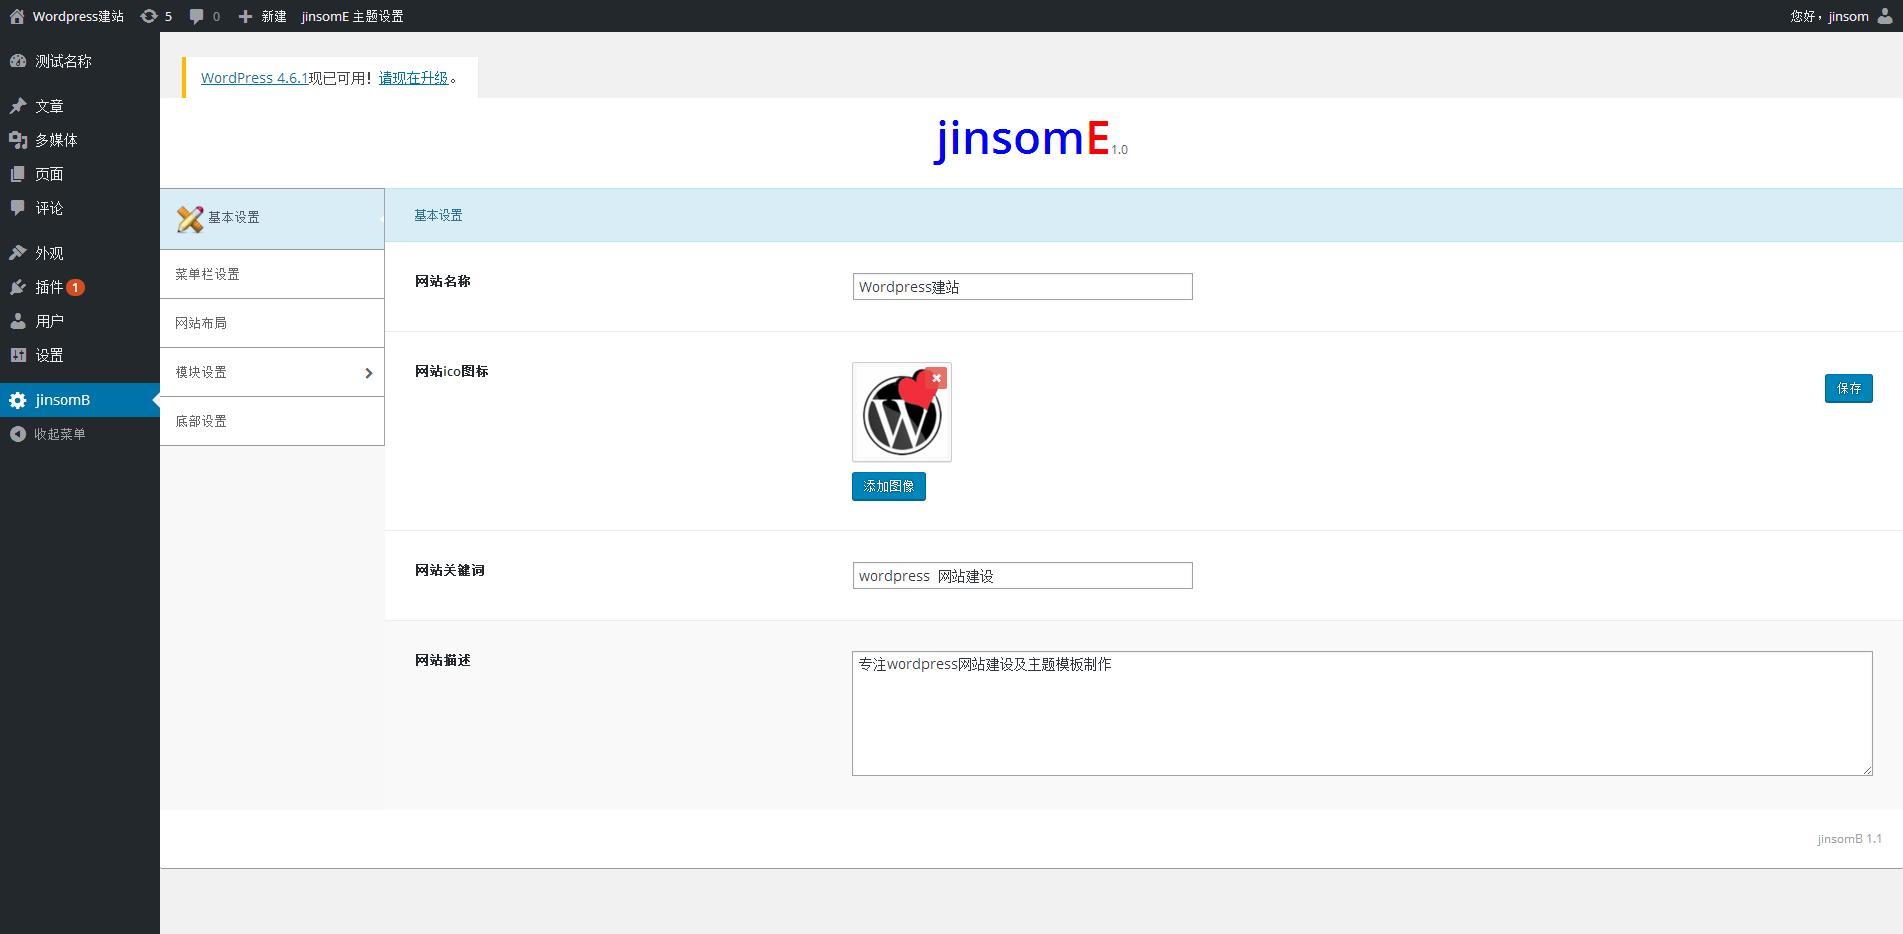 jinsomb-wordpress%e5%bb%ba%e7%ab%99-wordpress